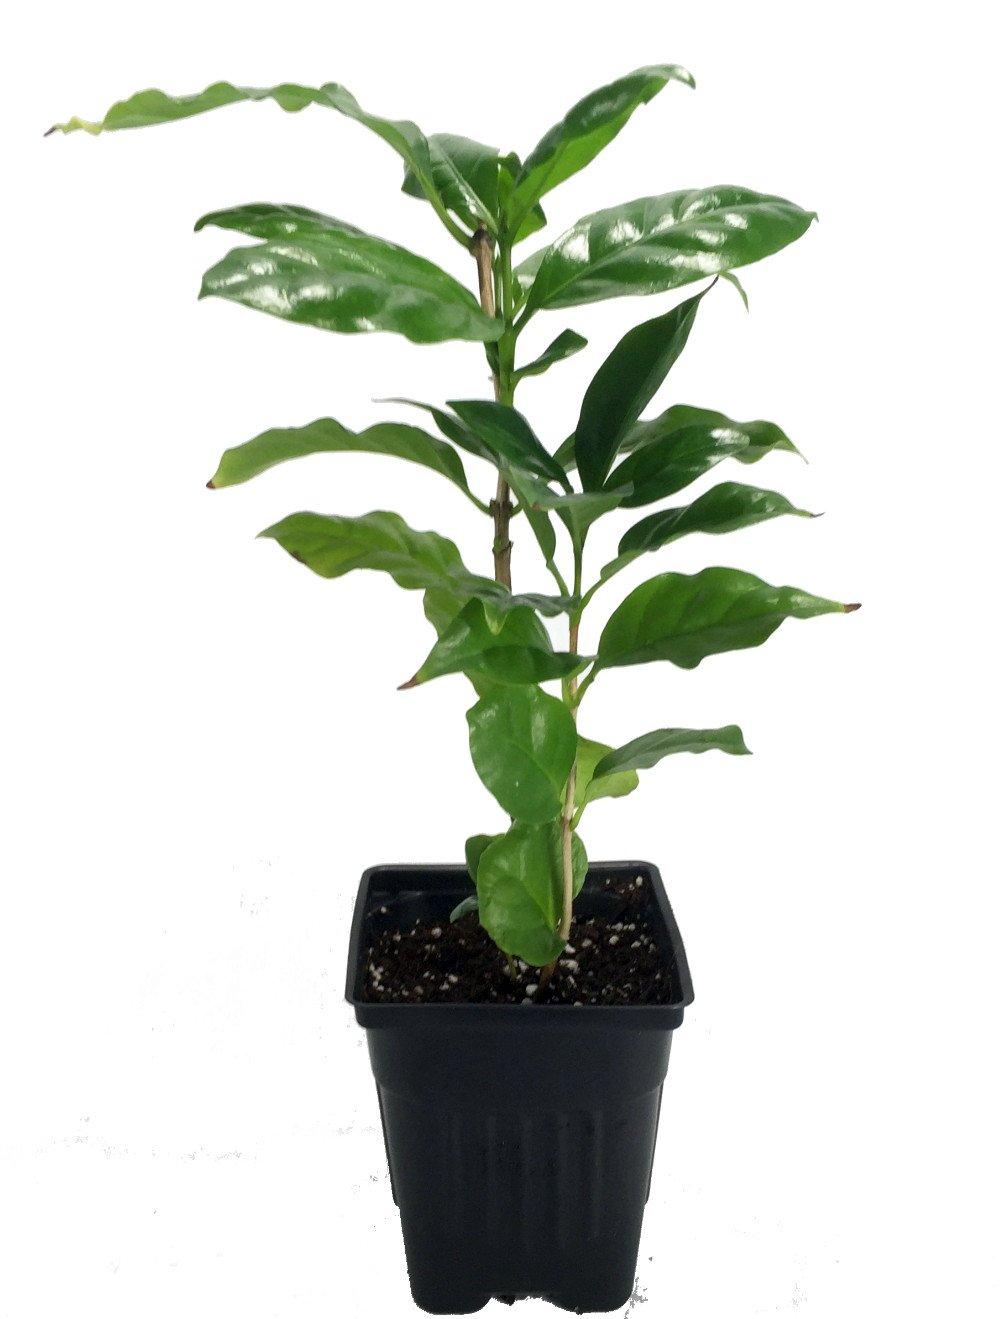 Hirt's Arabica Coffee Bean Plant – 3.5″ pot – Grow & Brew Your Own Coffee Beans